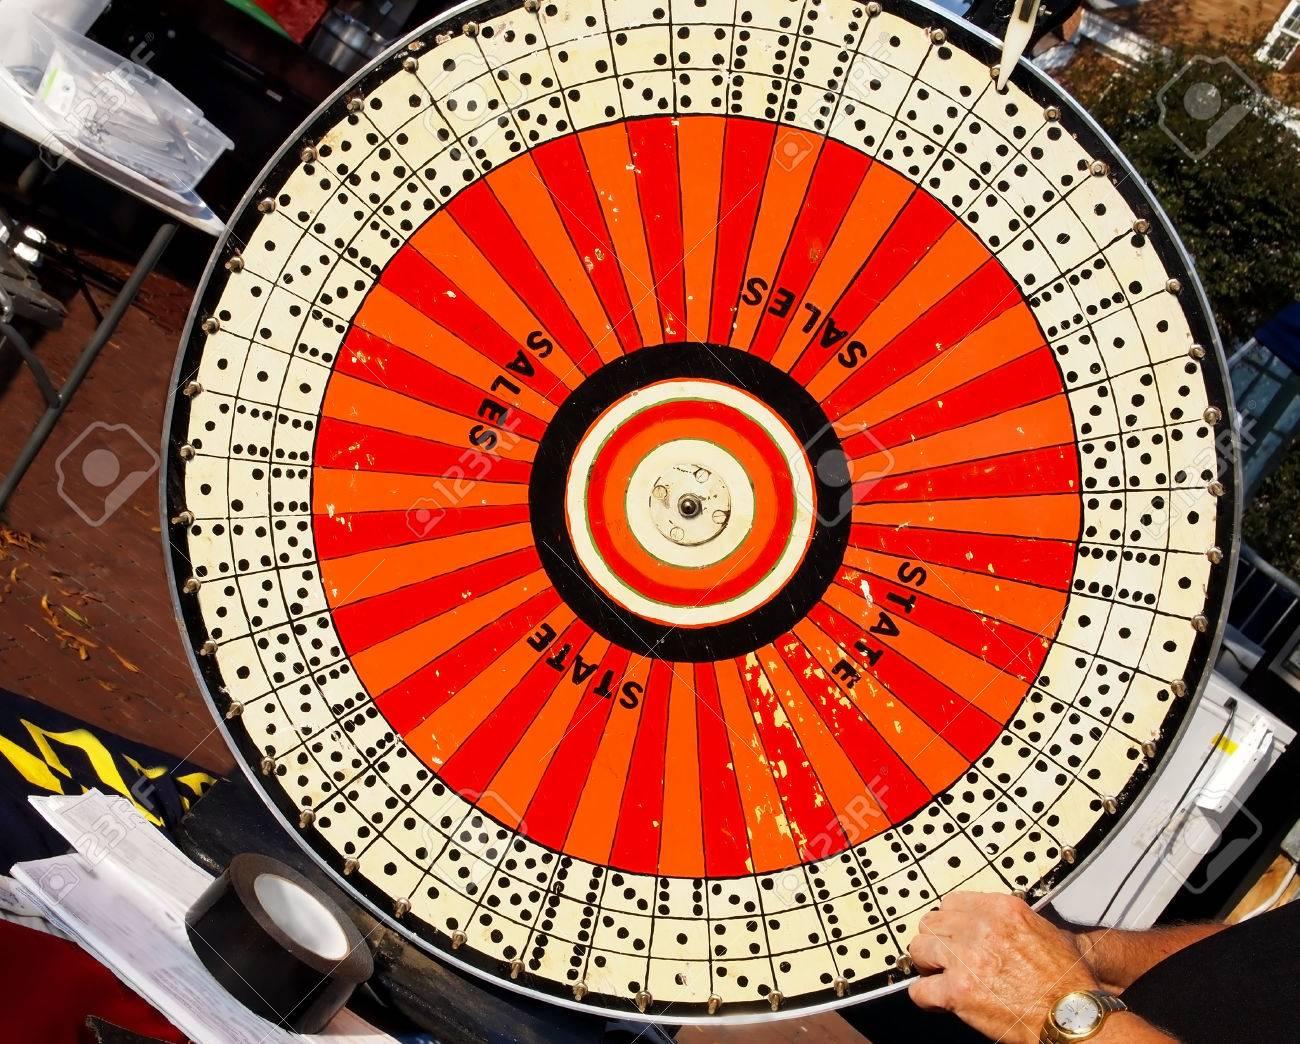 Casino Spinning Wheel Game Of Chance